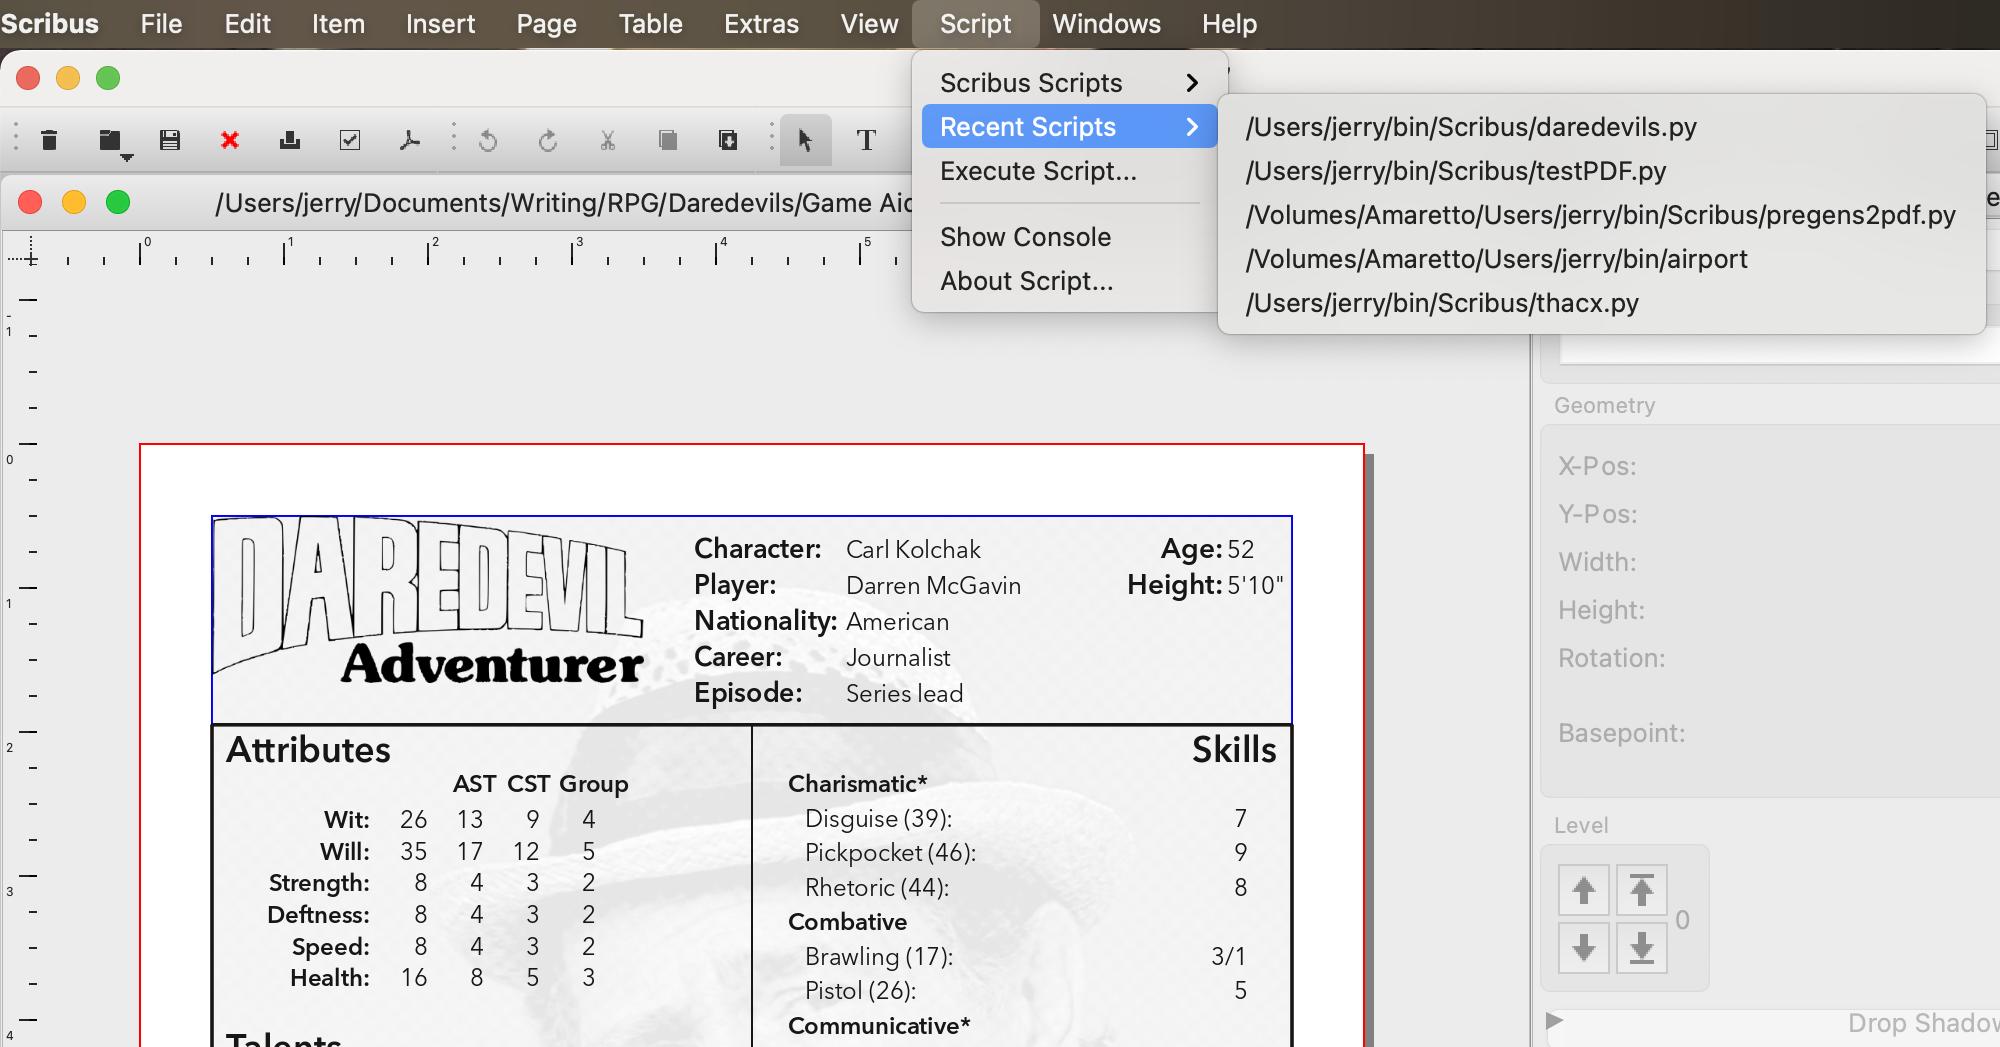 Scribus Script menu